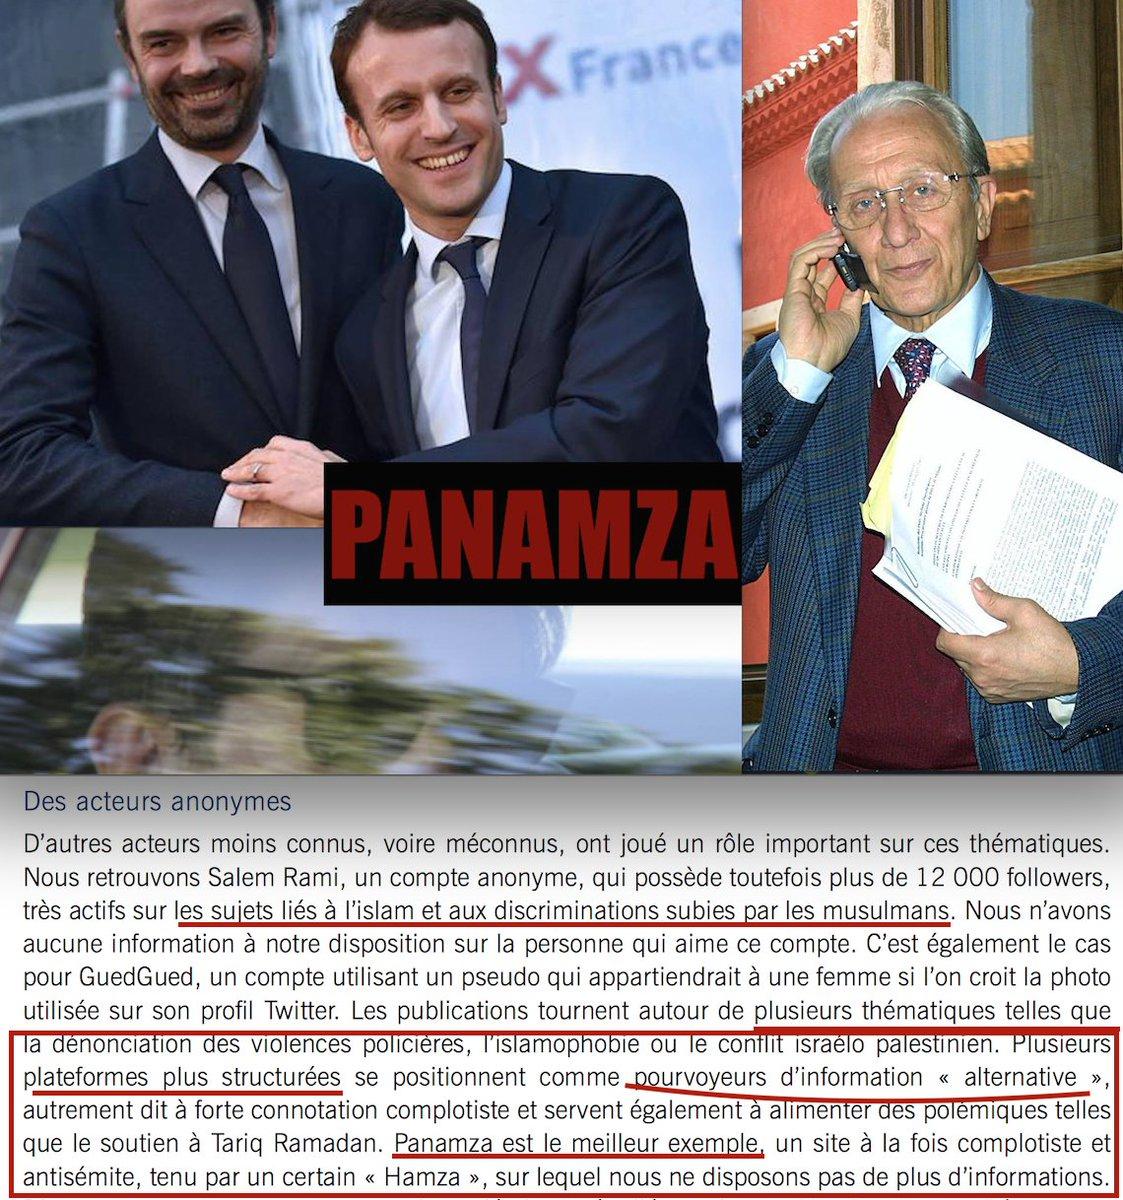 Panamza dans la ligne de mire du Bilderberg